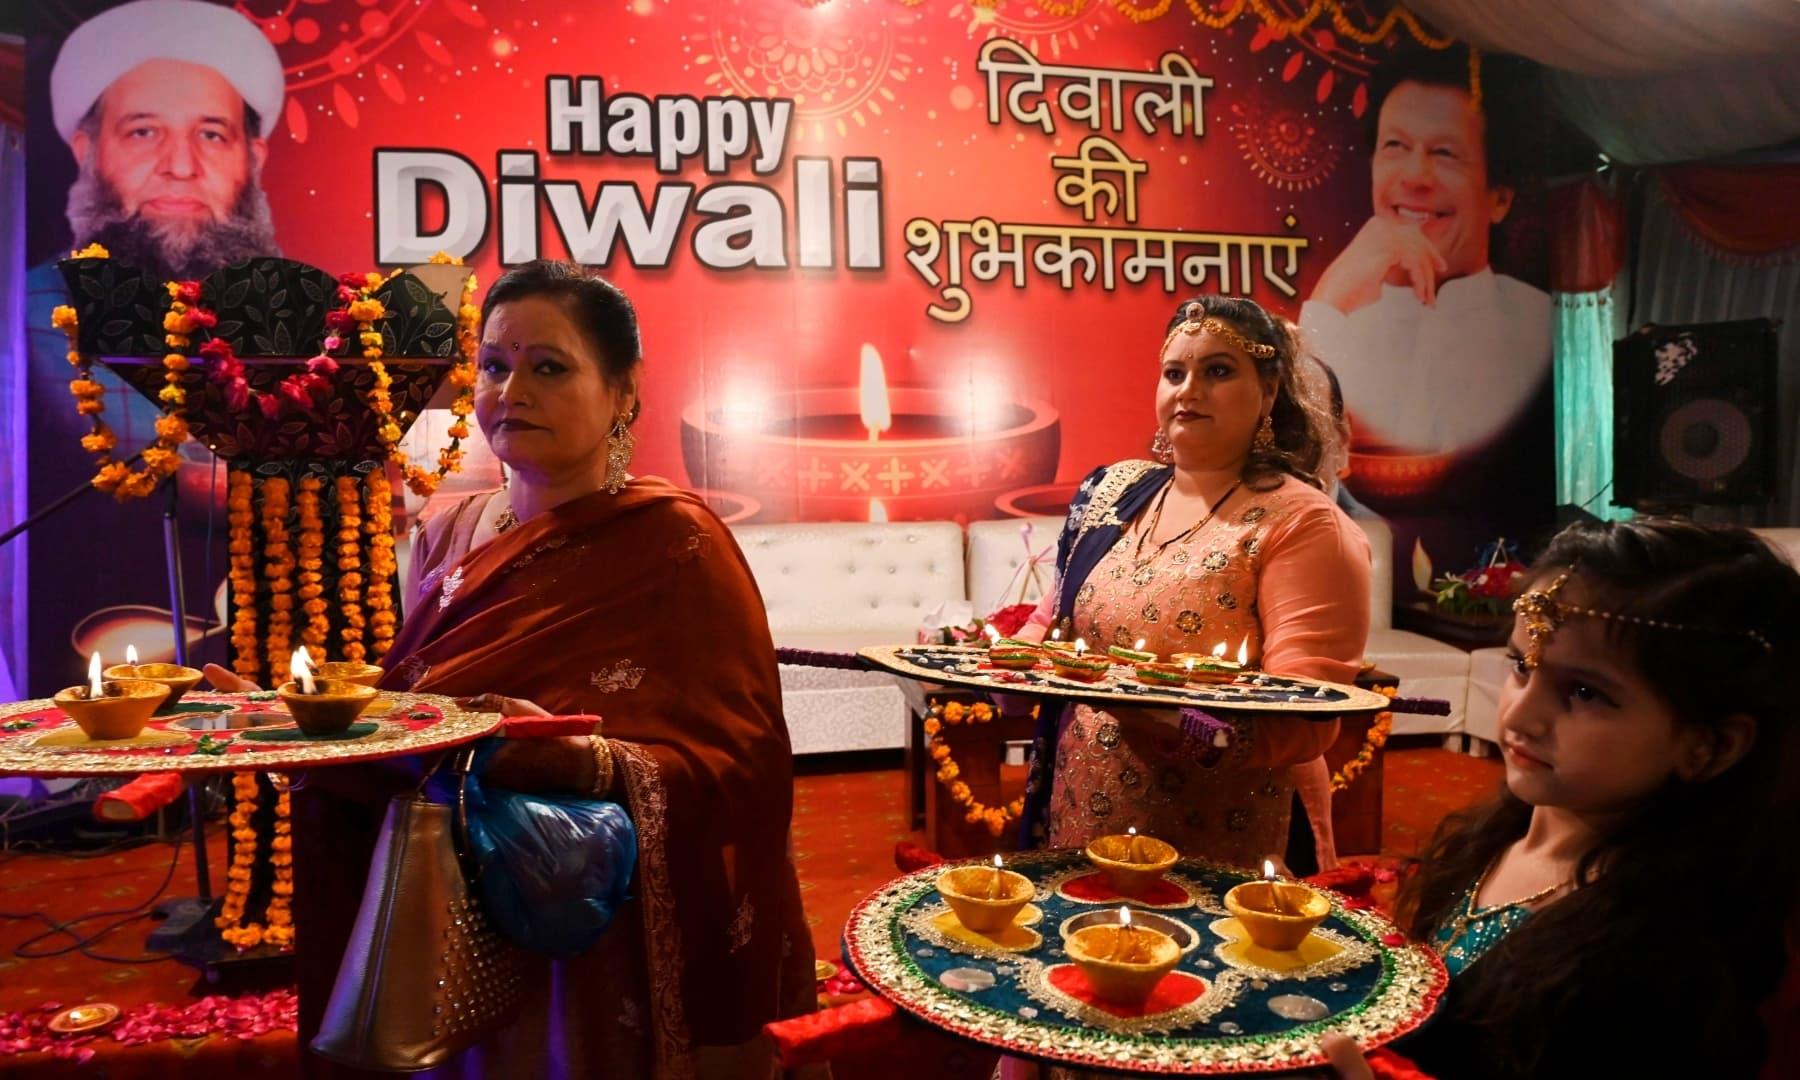 Hindu women celebrate Diwali at Krishna Mandir in Lahore on November 14. — AFP